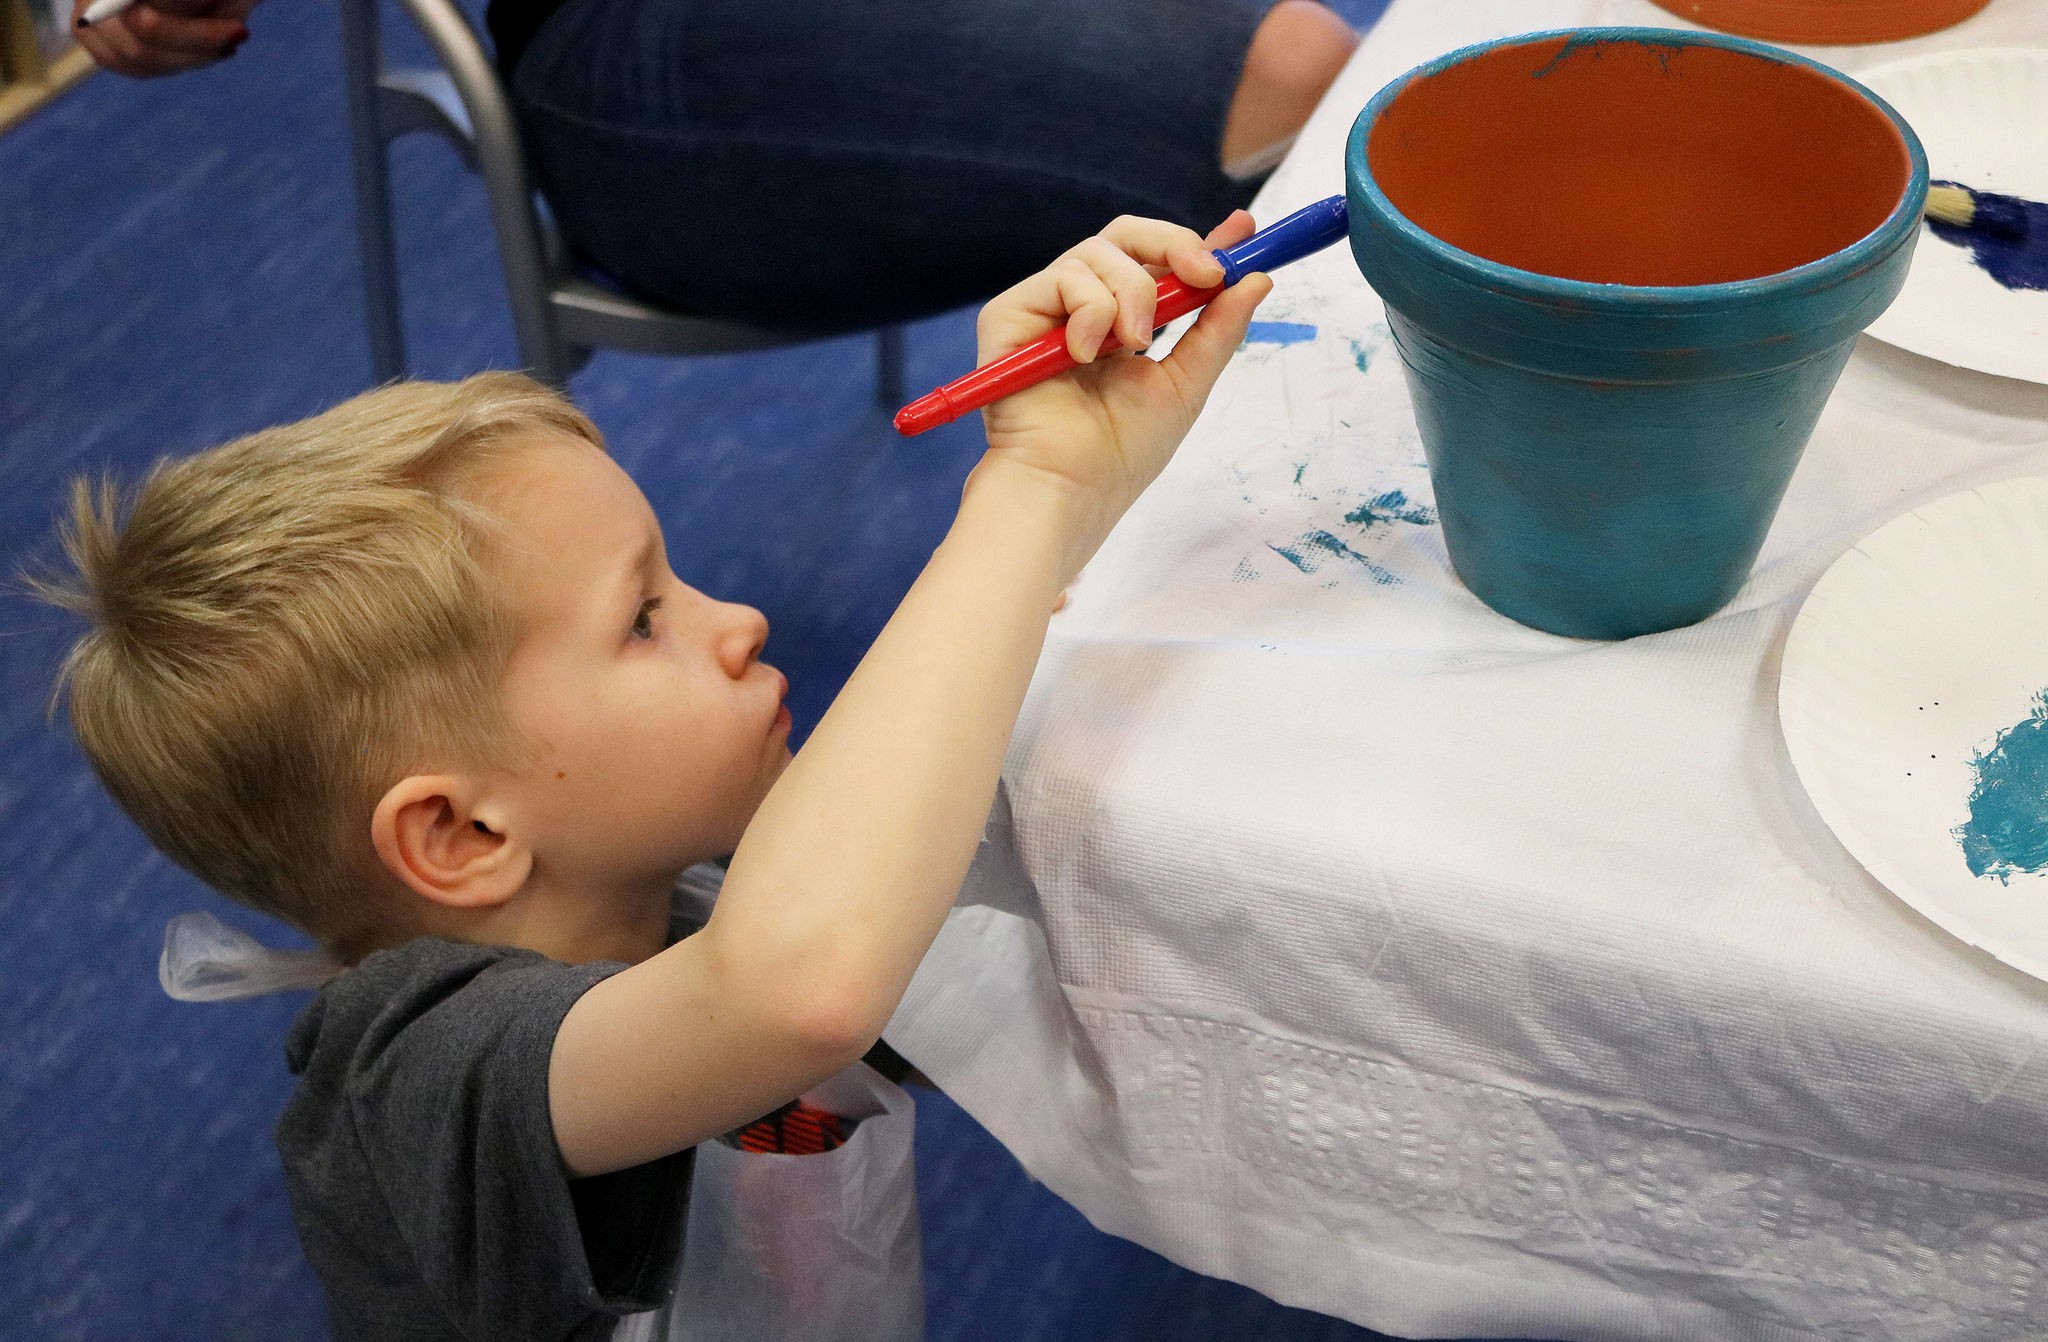 Abram painting a pot